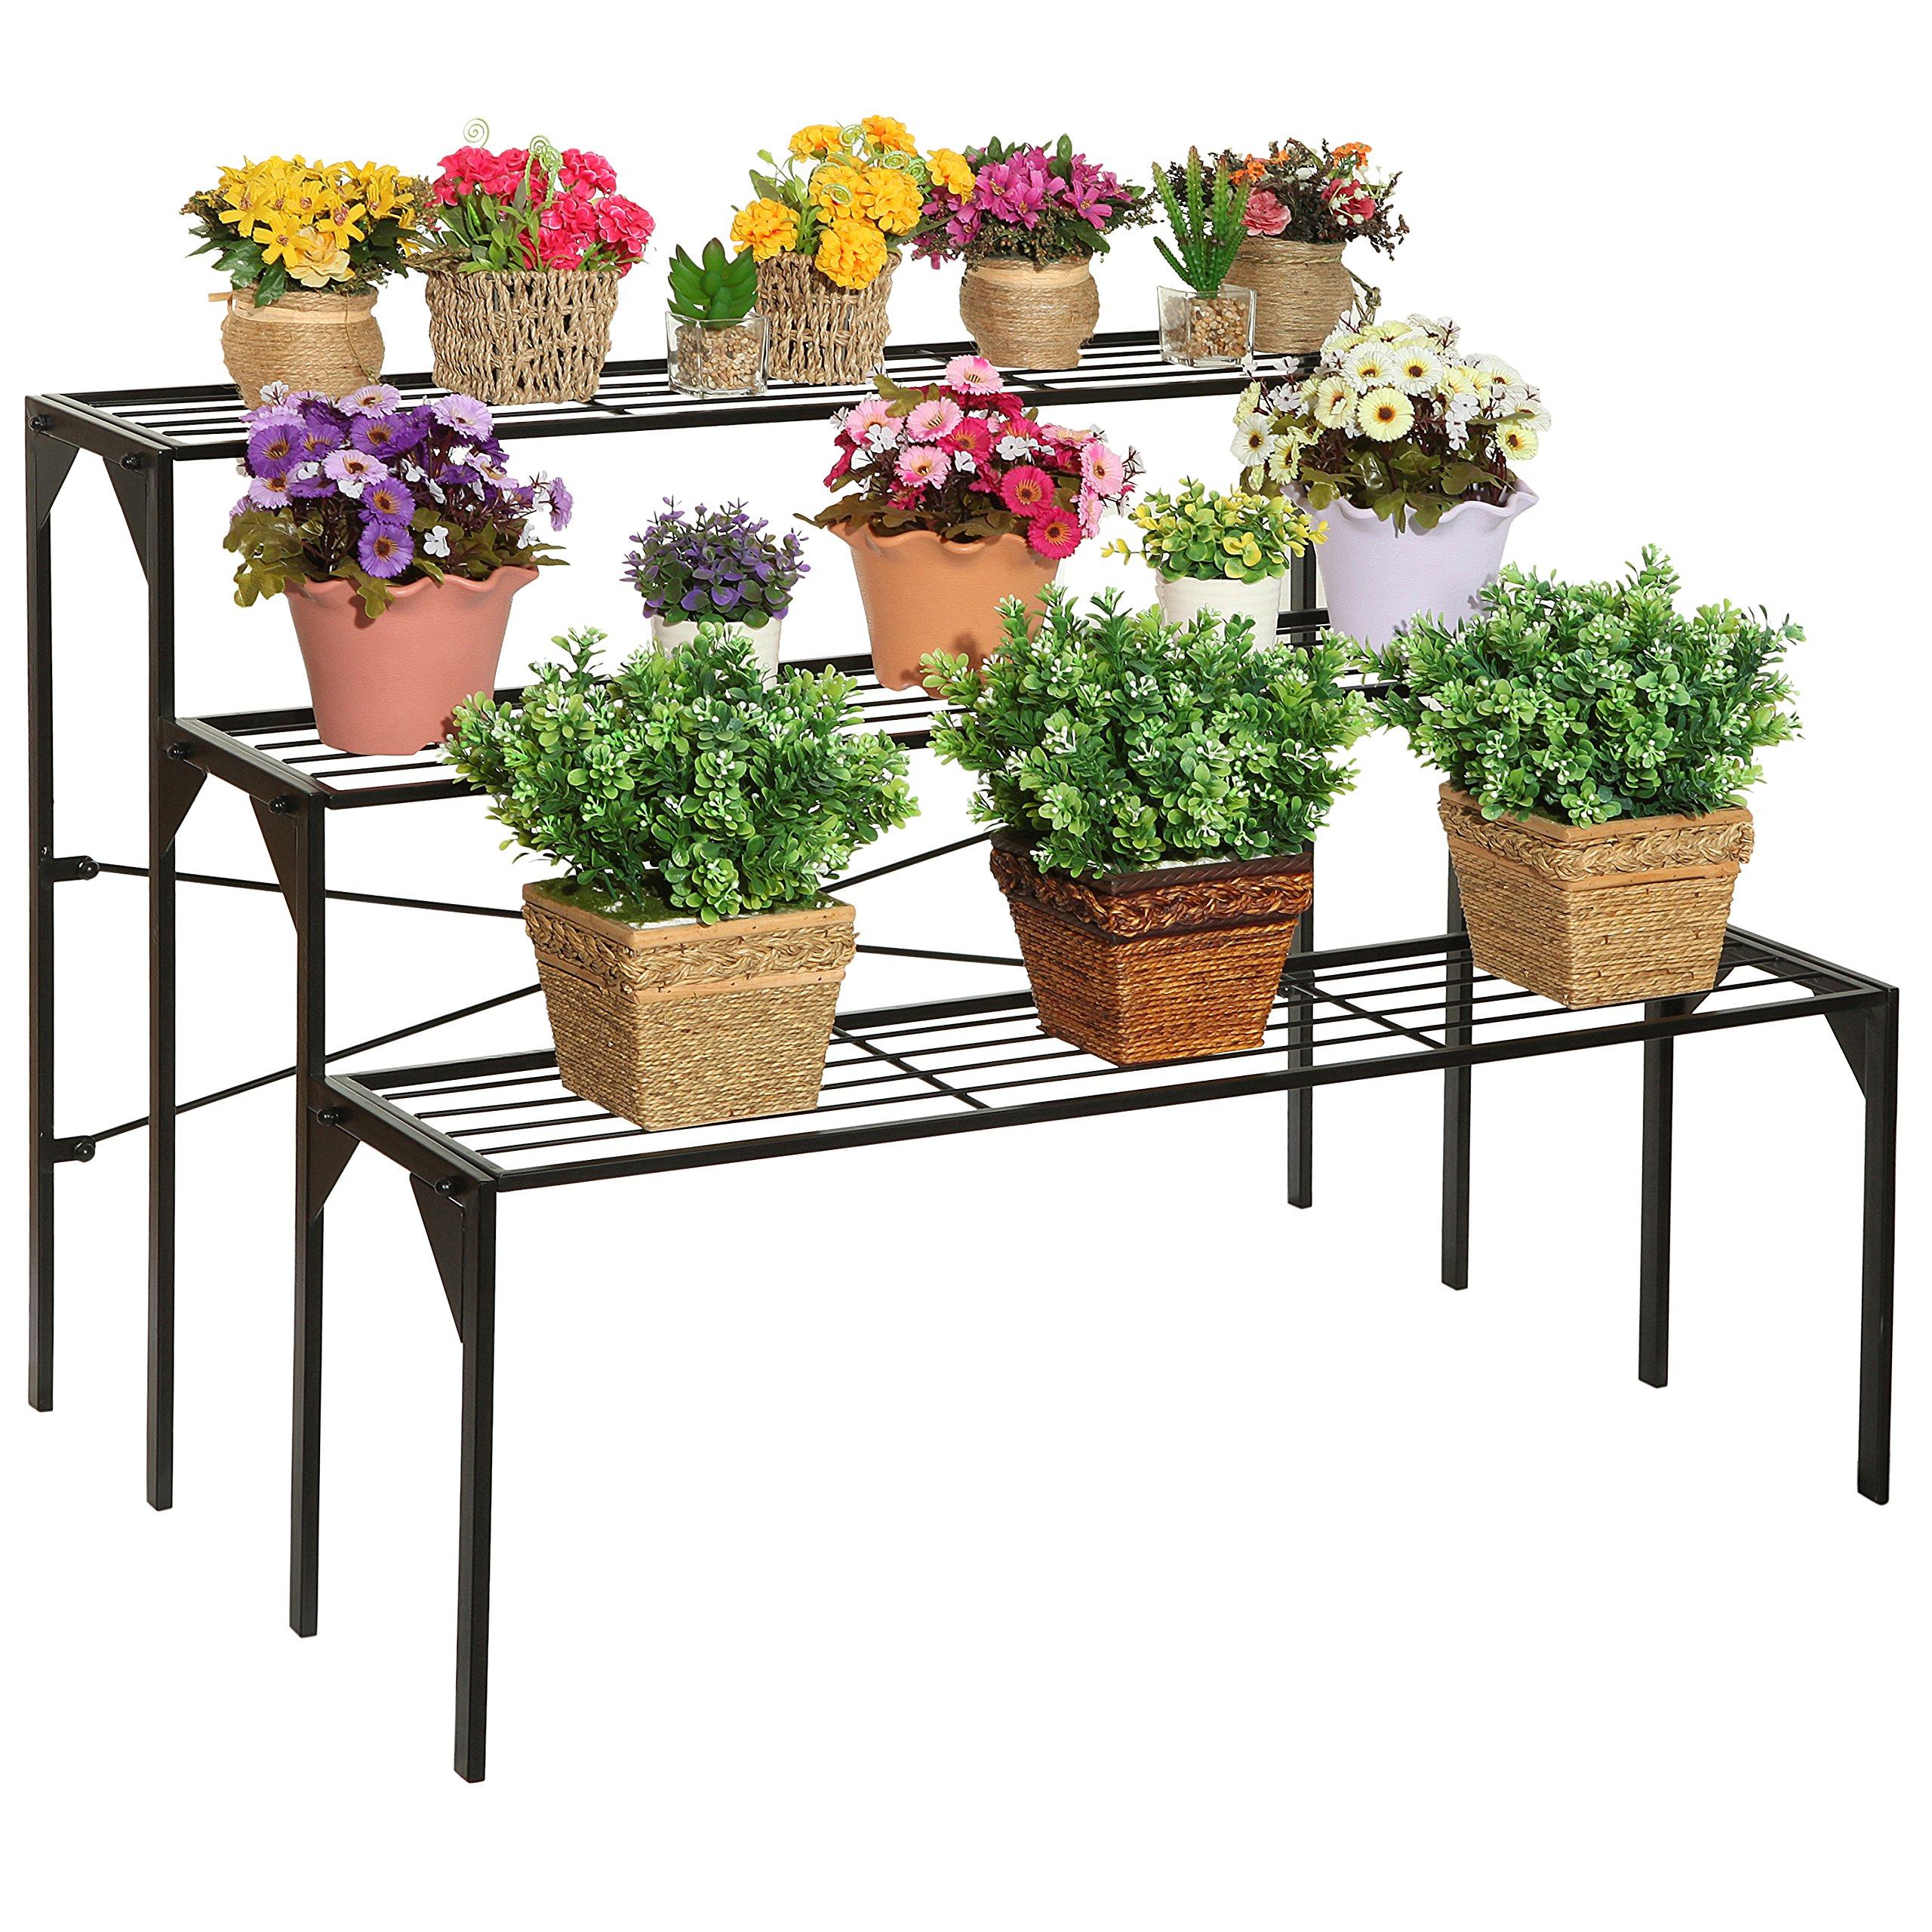 Large Modern Black Metal 3 Tier Shelf Flower Plant Display Stand Rack / Freestanding Home Decor Shelves